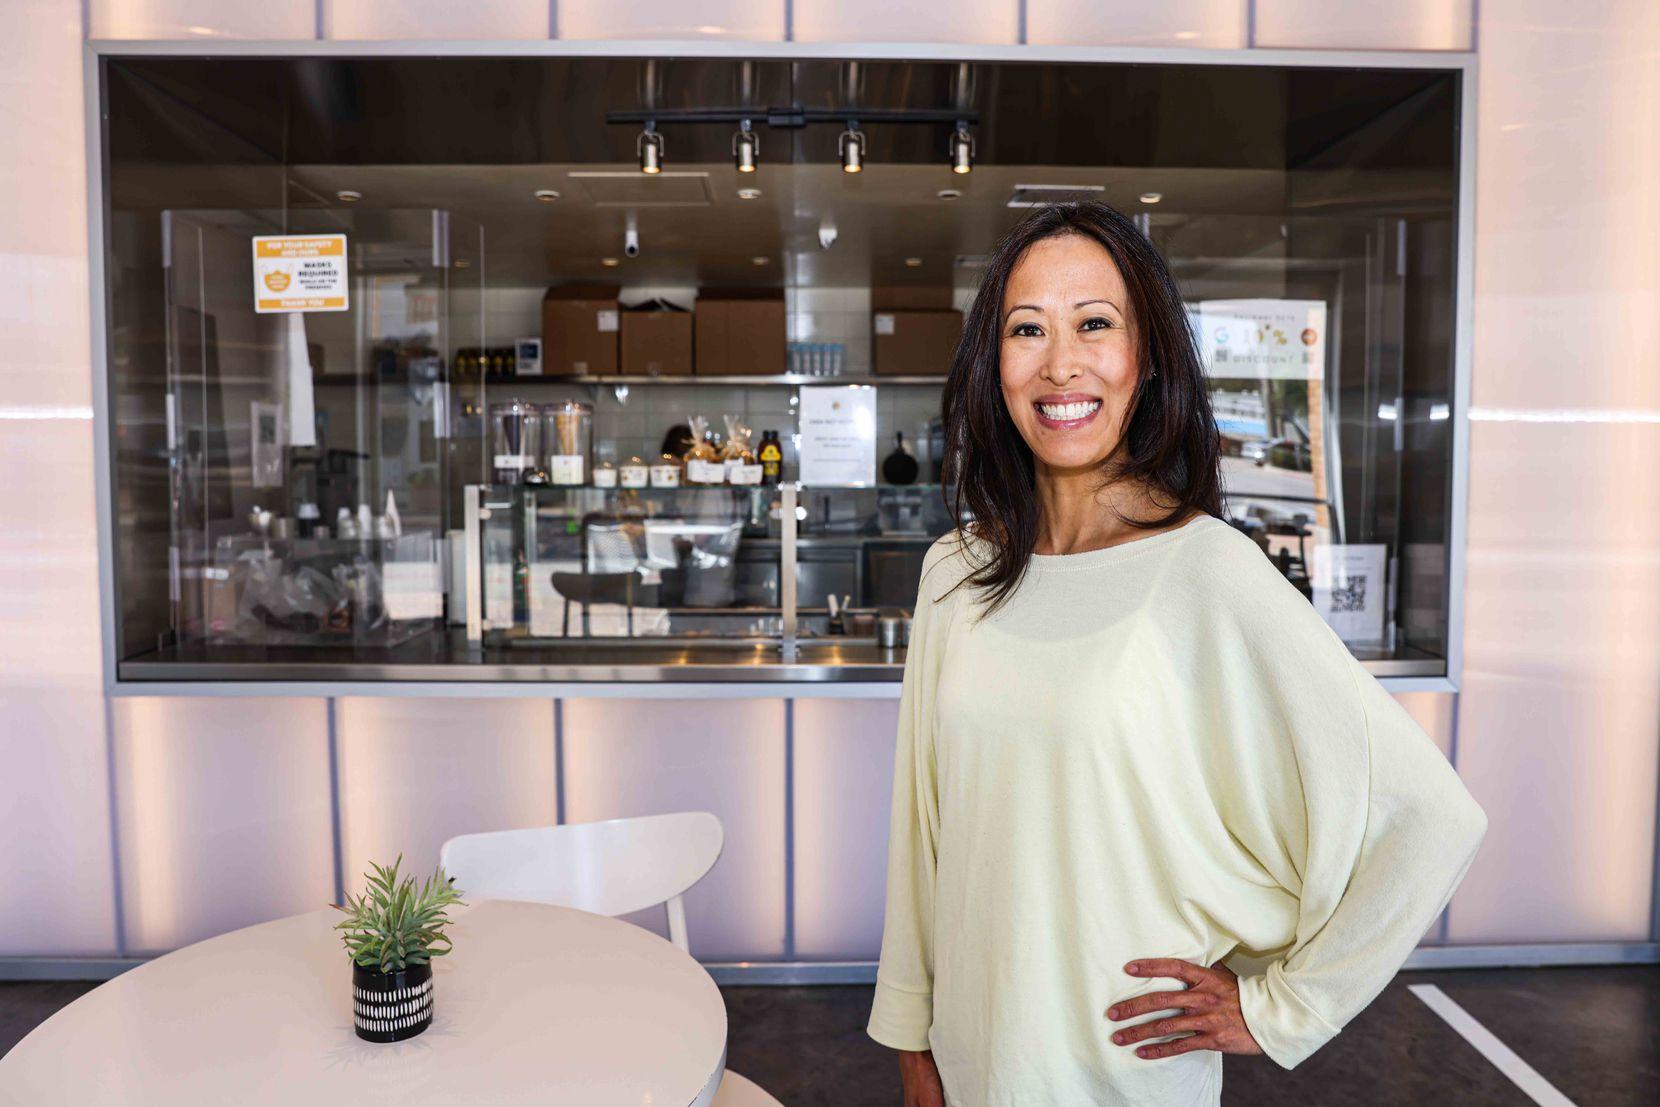 Cindy Chung, CEO of Pure Milk & Honey in Dallas